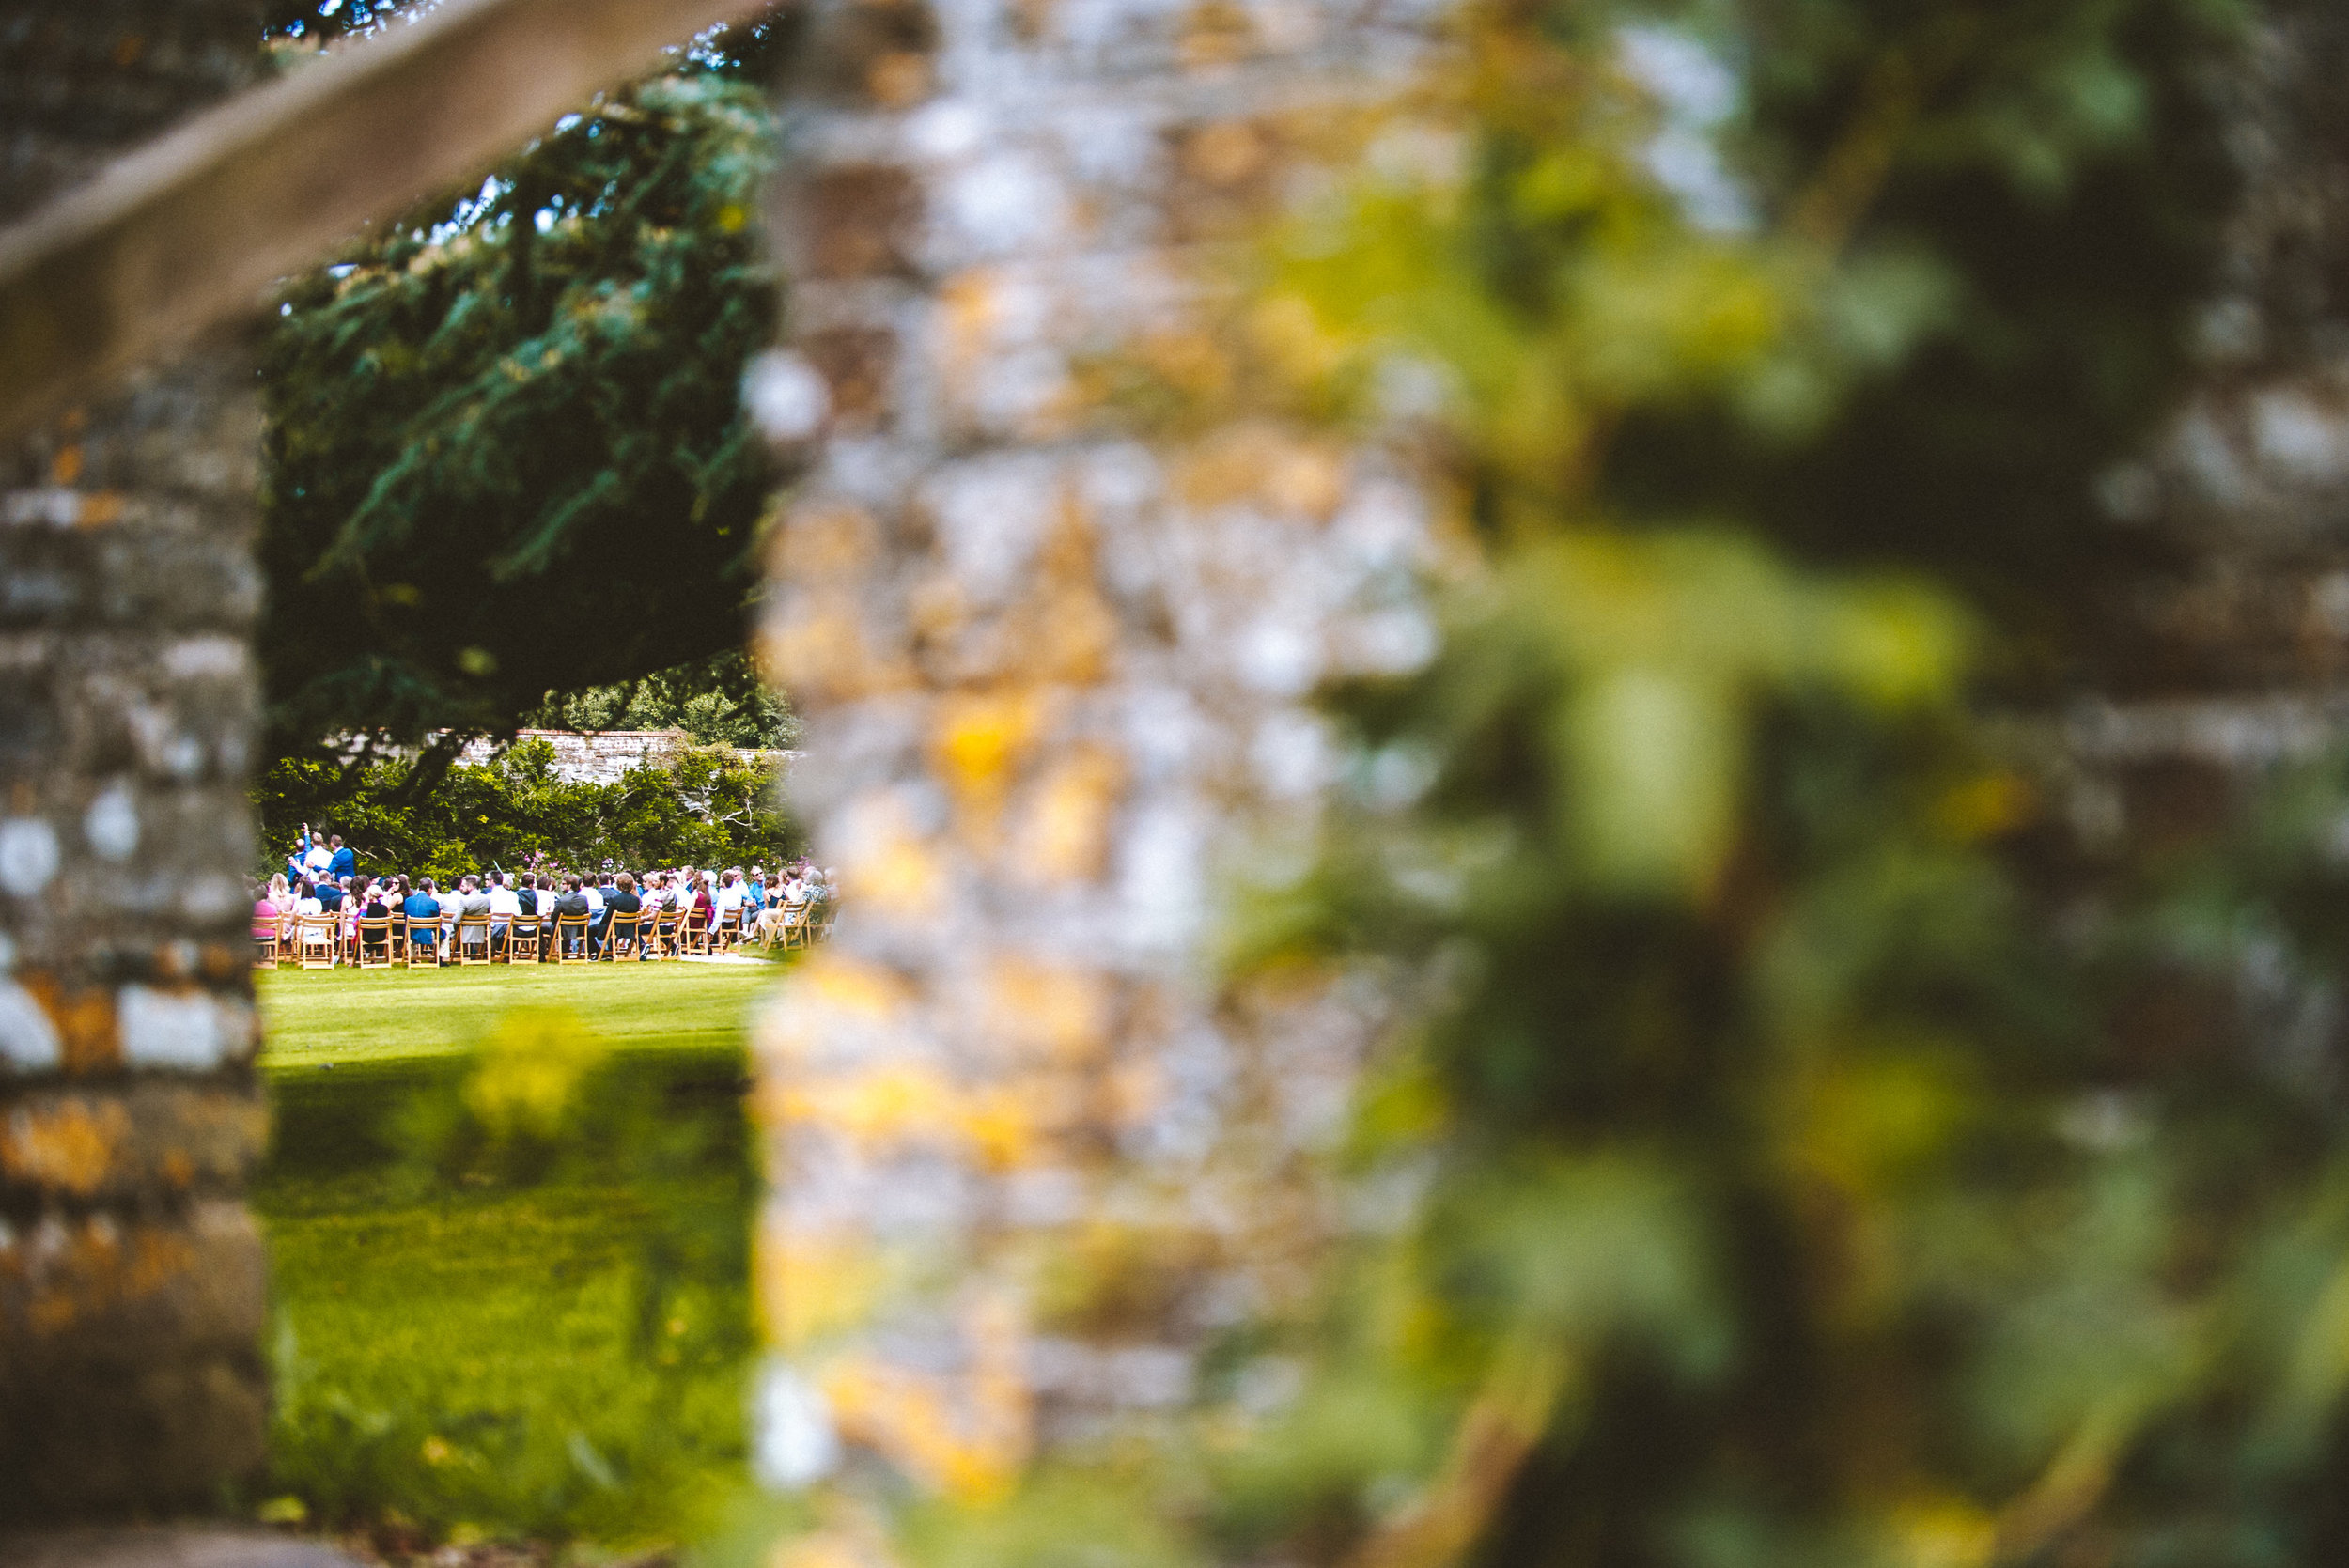 pencarrow-house-wedding-photographer-32.jpg